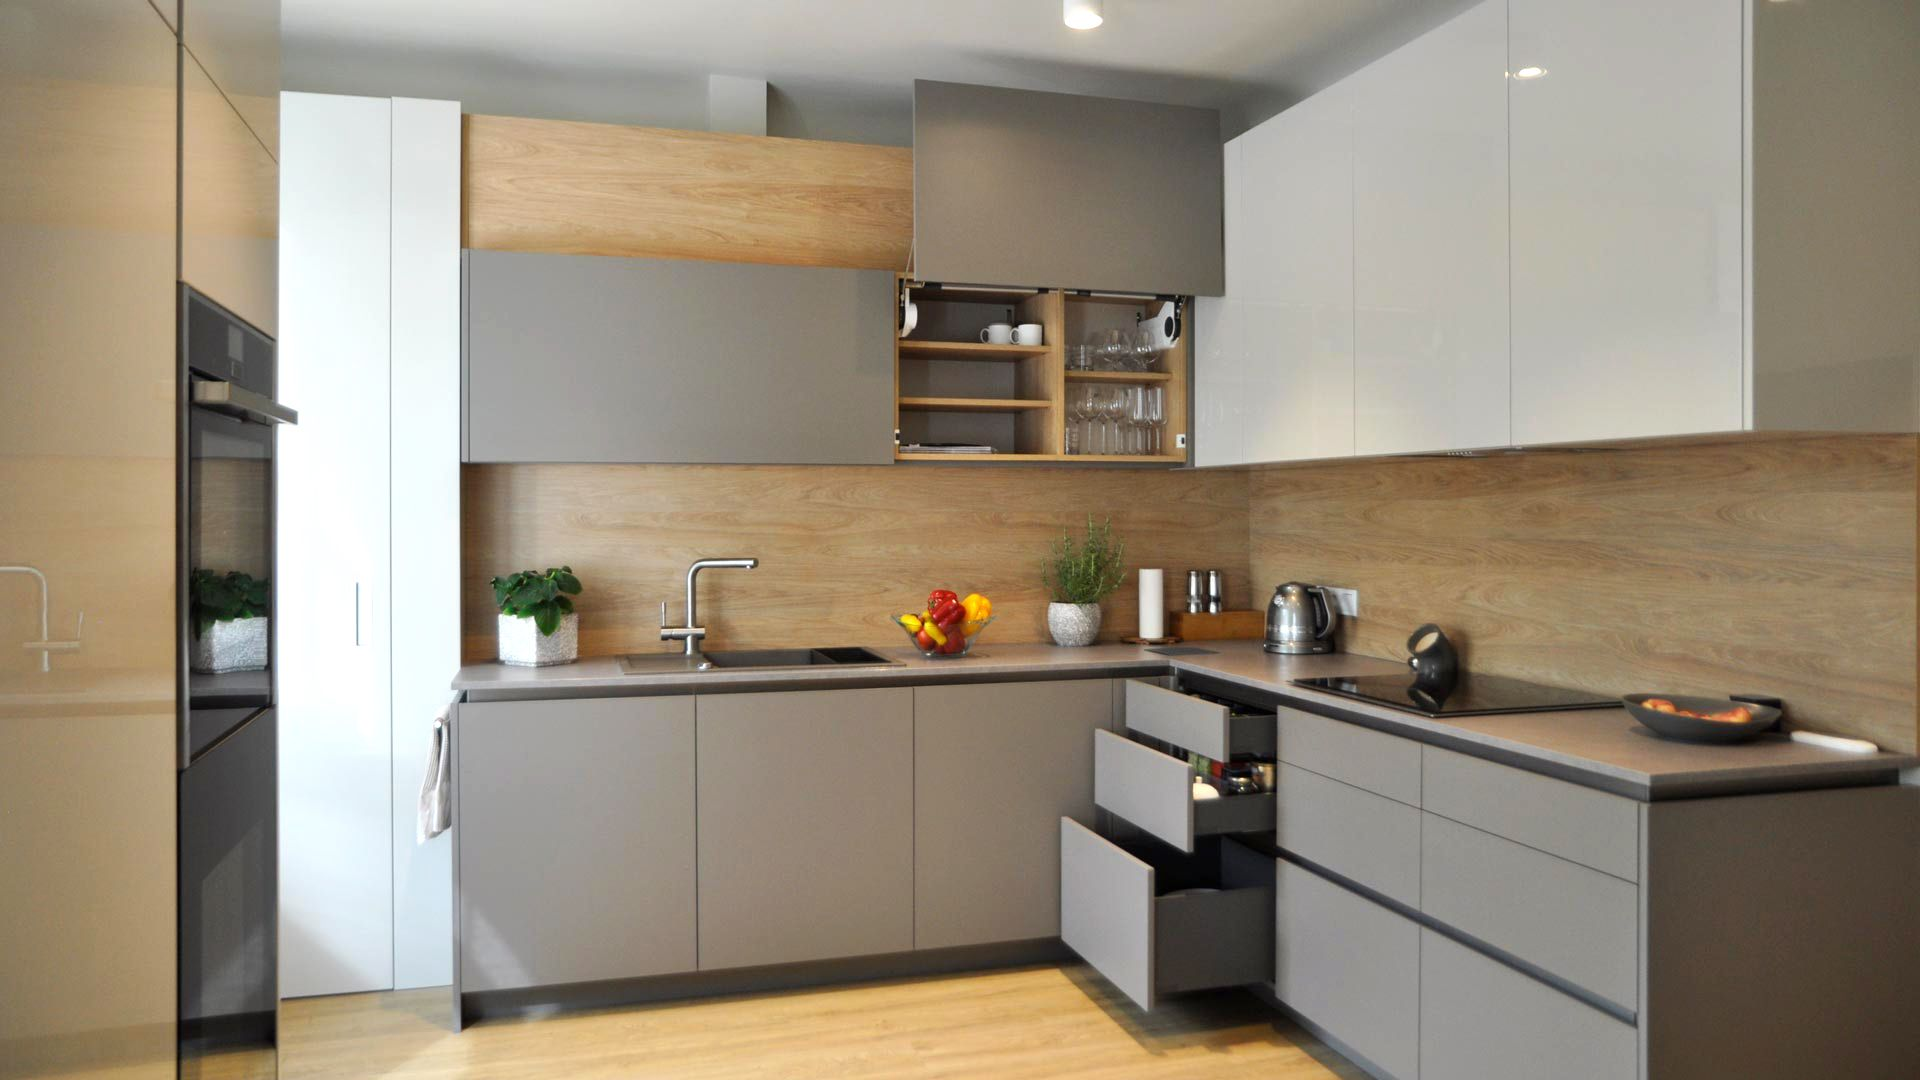 Kitchen Integra By Ripo Harmonic Kitchen Furniture Set Modern